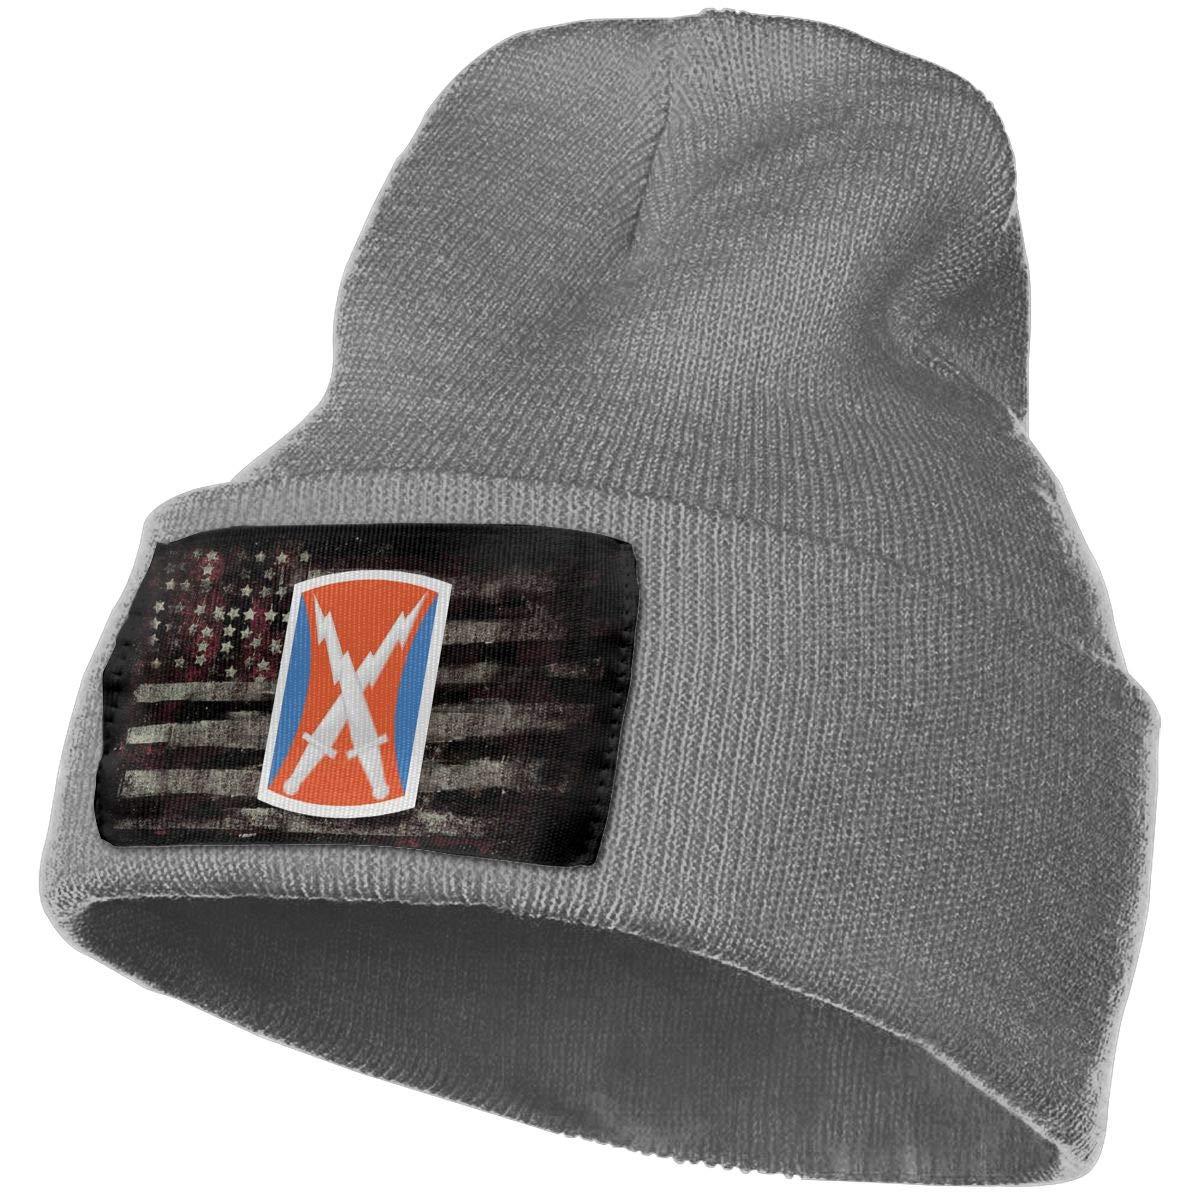 Army 106th Signal Brigade Mens Beanie Cap Skull Cap Winter Warm Knitting Hats.